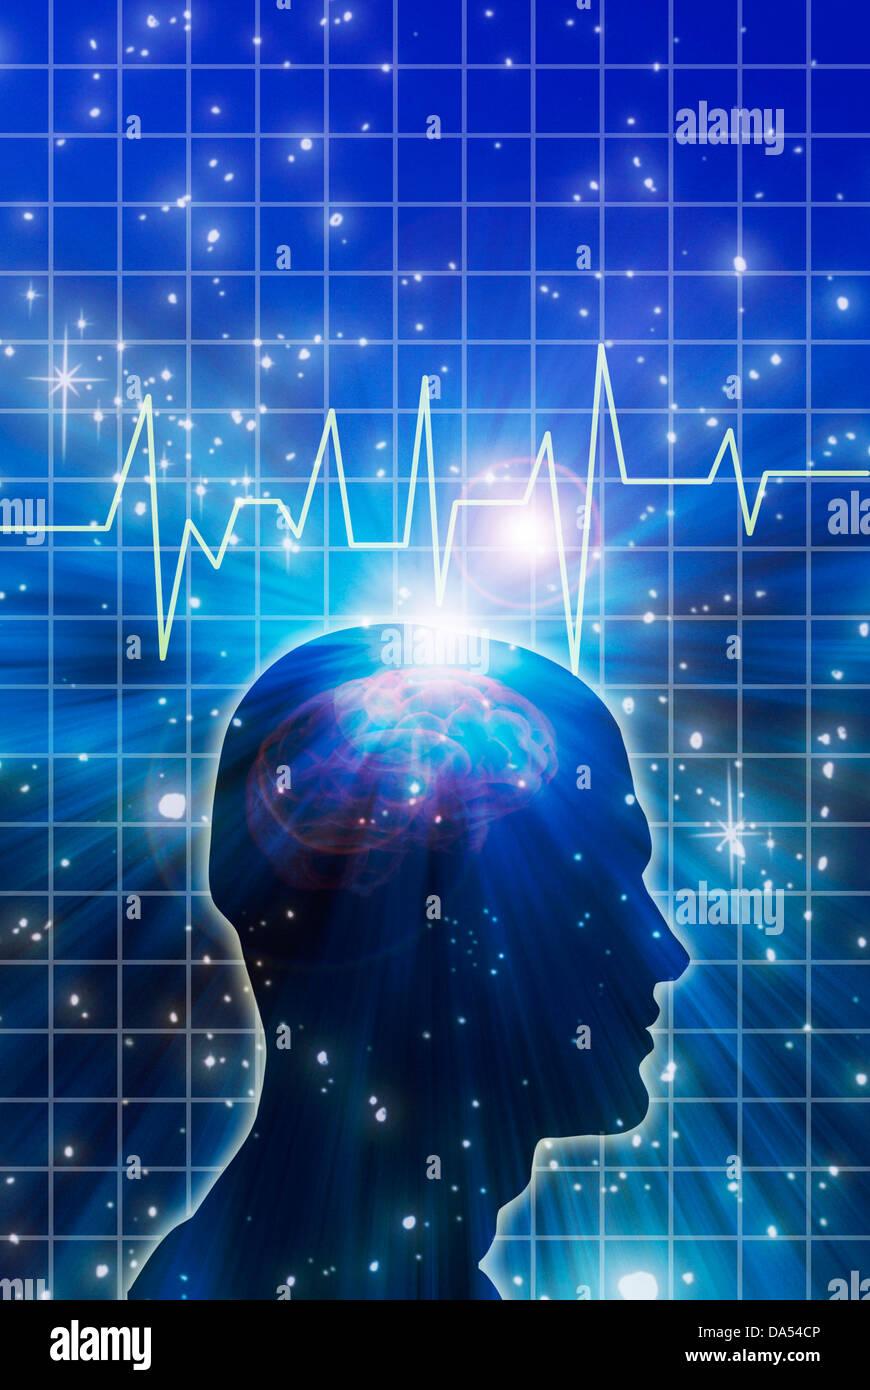 human head silhouette with brain waves or EEG - Stock Image